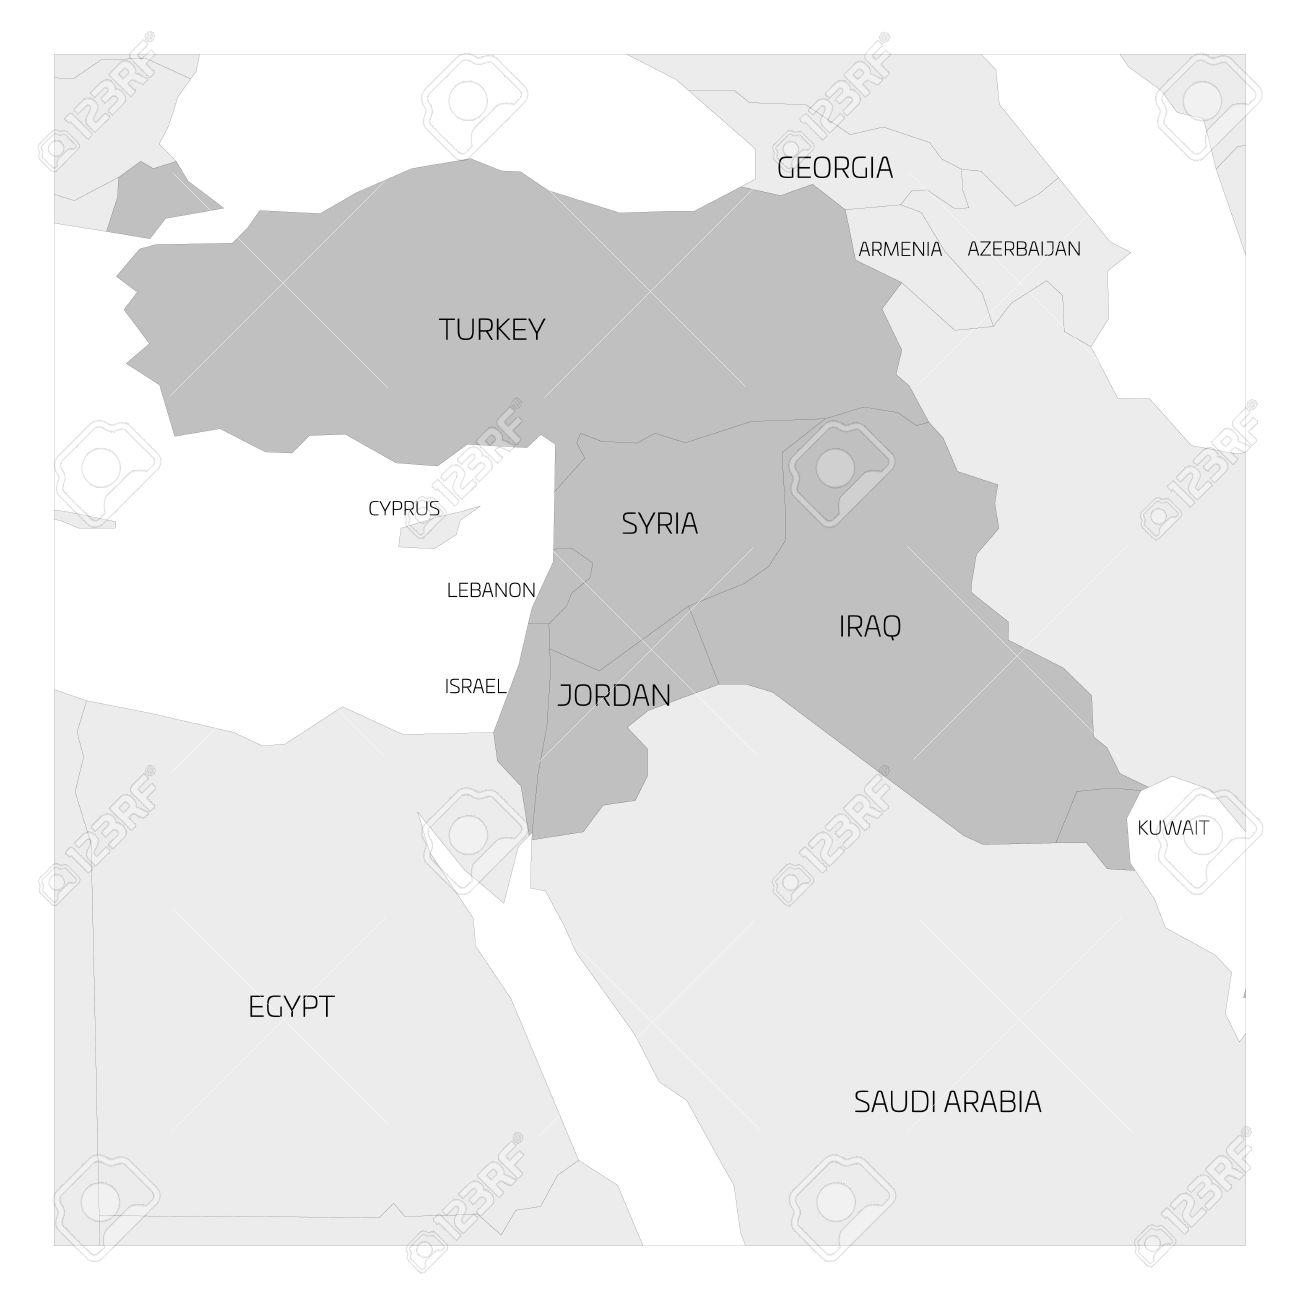 Karte Naher Osten Israel.Stock Photo